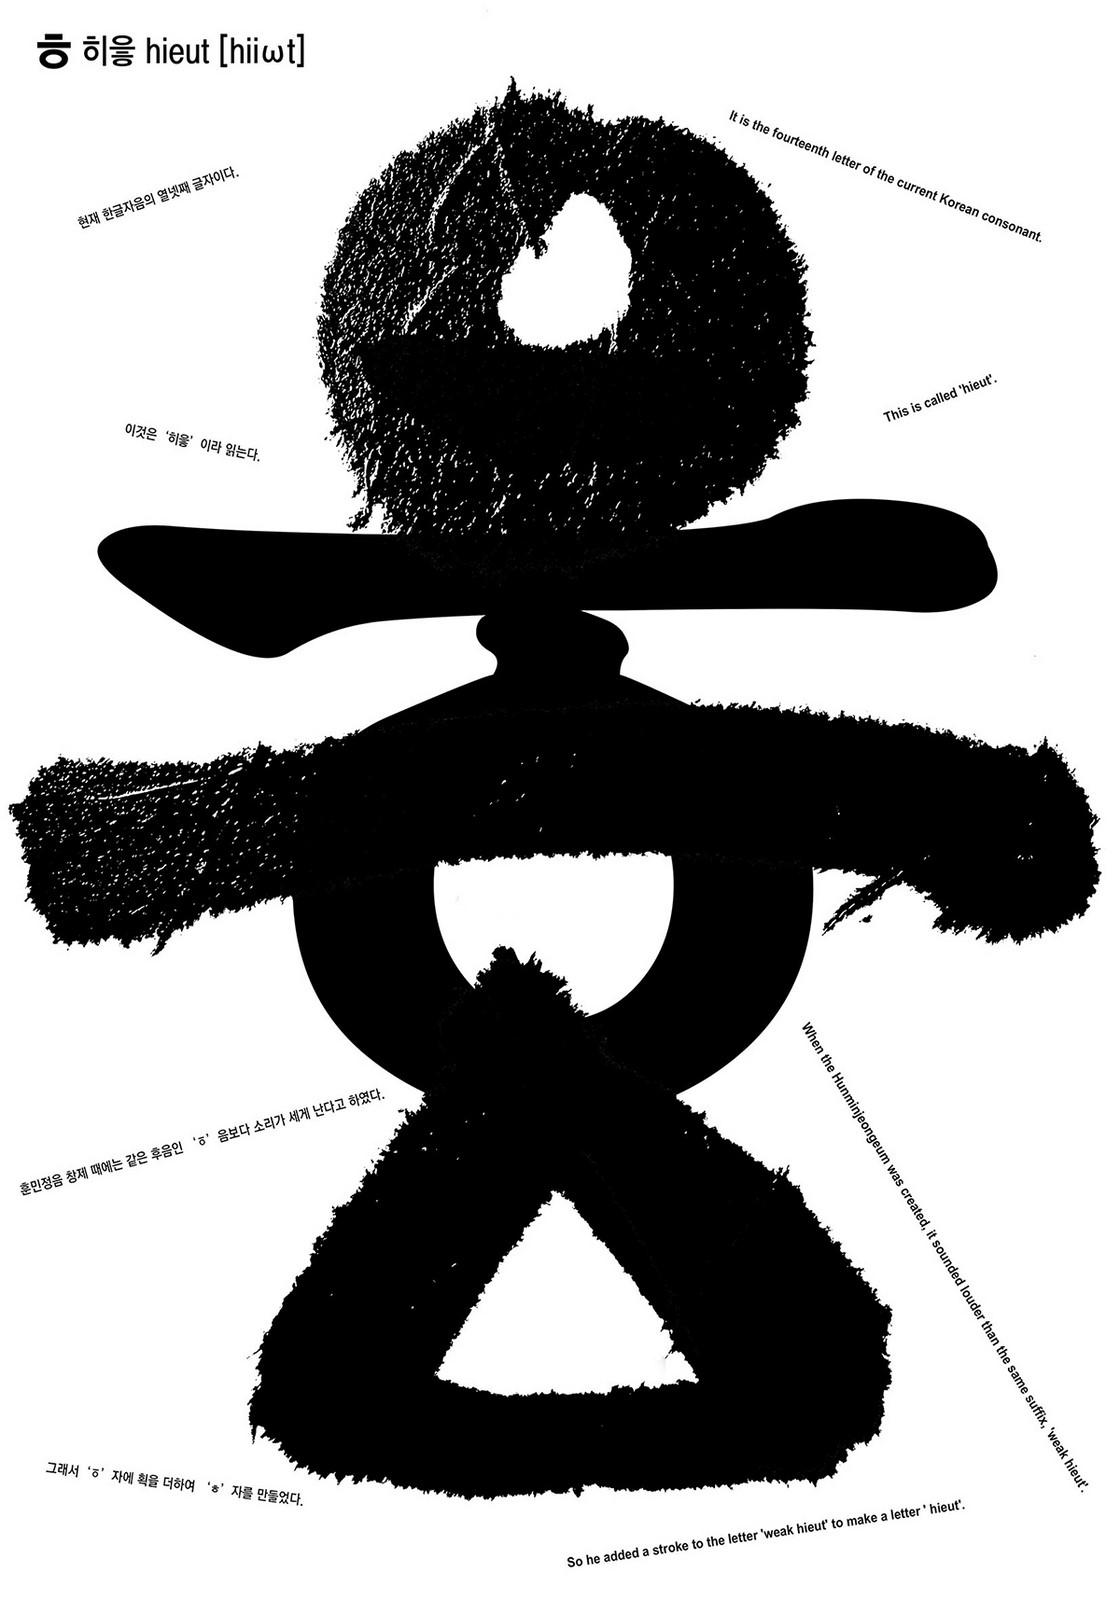 "<p><span lang='EN-US'>""Hangul Hieut"" (Korece harf sistemi), Mürekkep kaligrafi 70 x 100 cm, 2020.</span><span lang='EN-US'><br /></span><em><span lang='EN-US'>""</span><span lang='EN-US'>Hangul Hieut"", Ink Calligraphy, 70 x 100 cm, 2020.</span></em></p>"